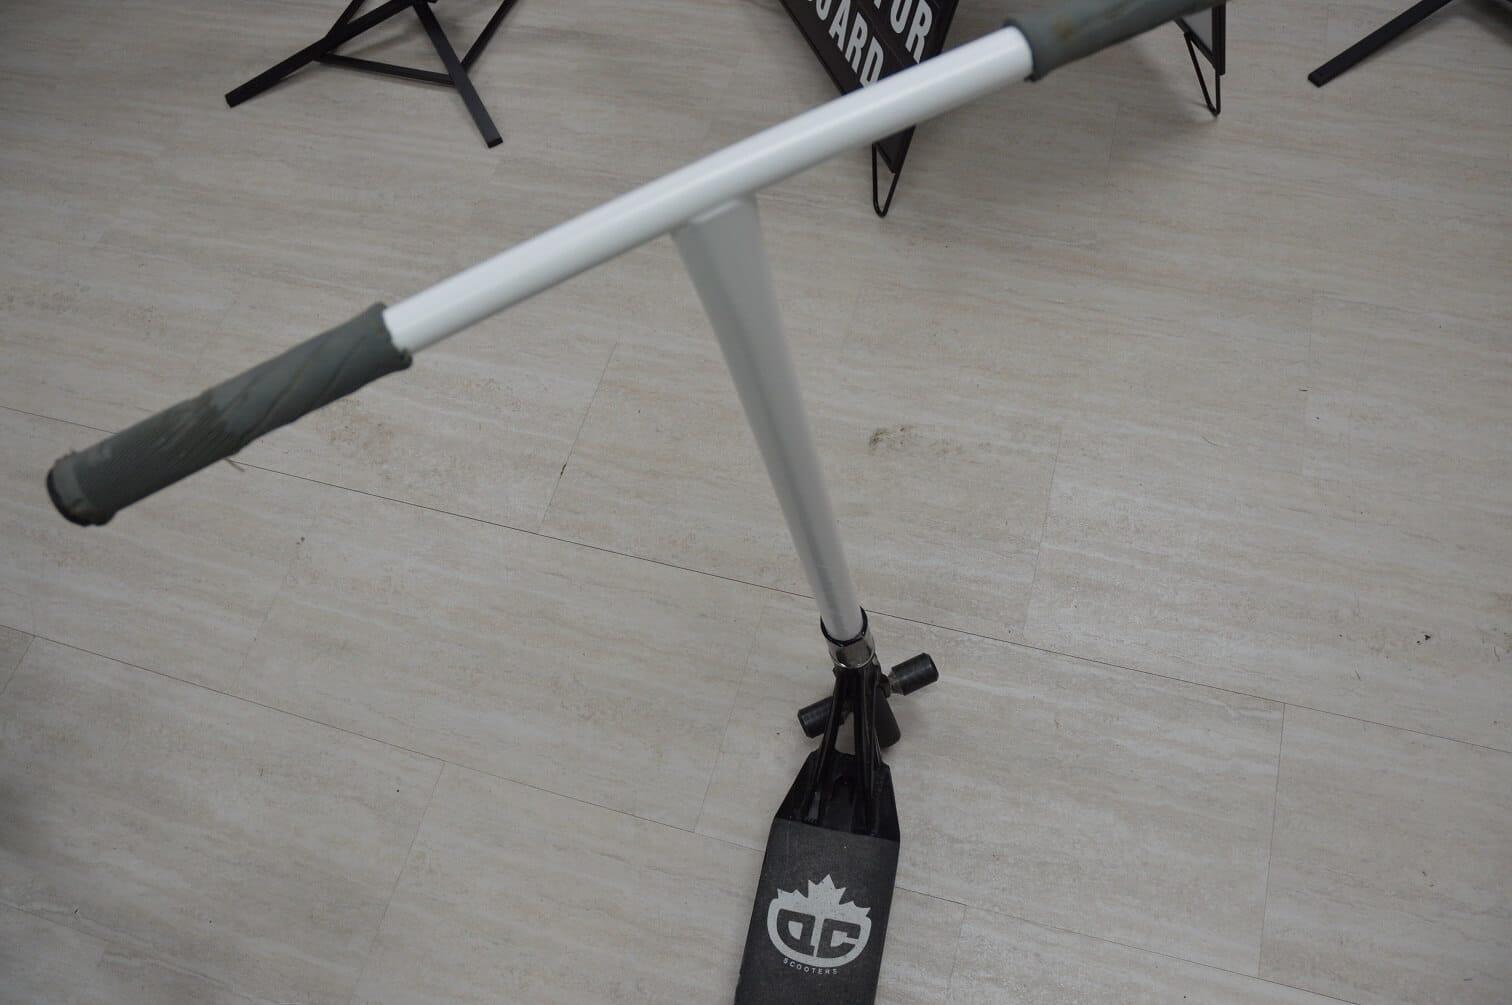 Scooter Wrap - Recreational Wrap Toronto